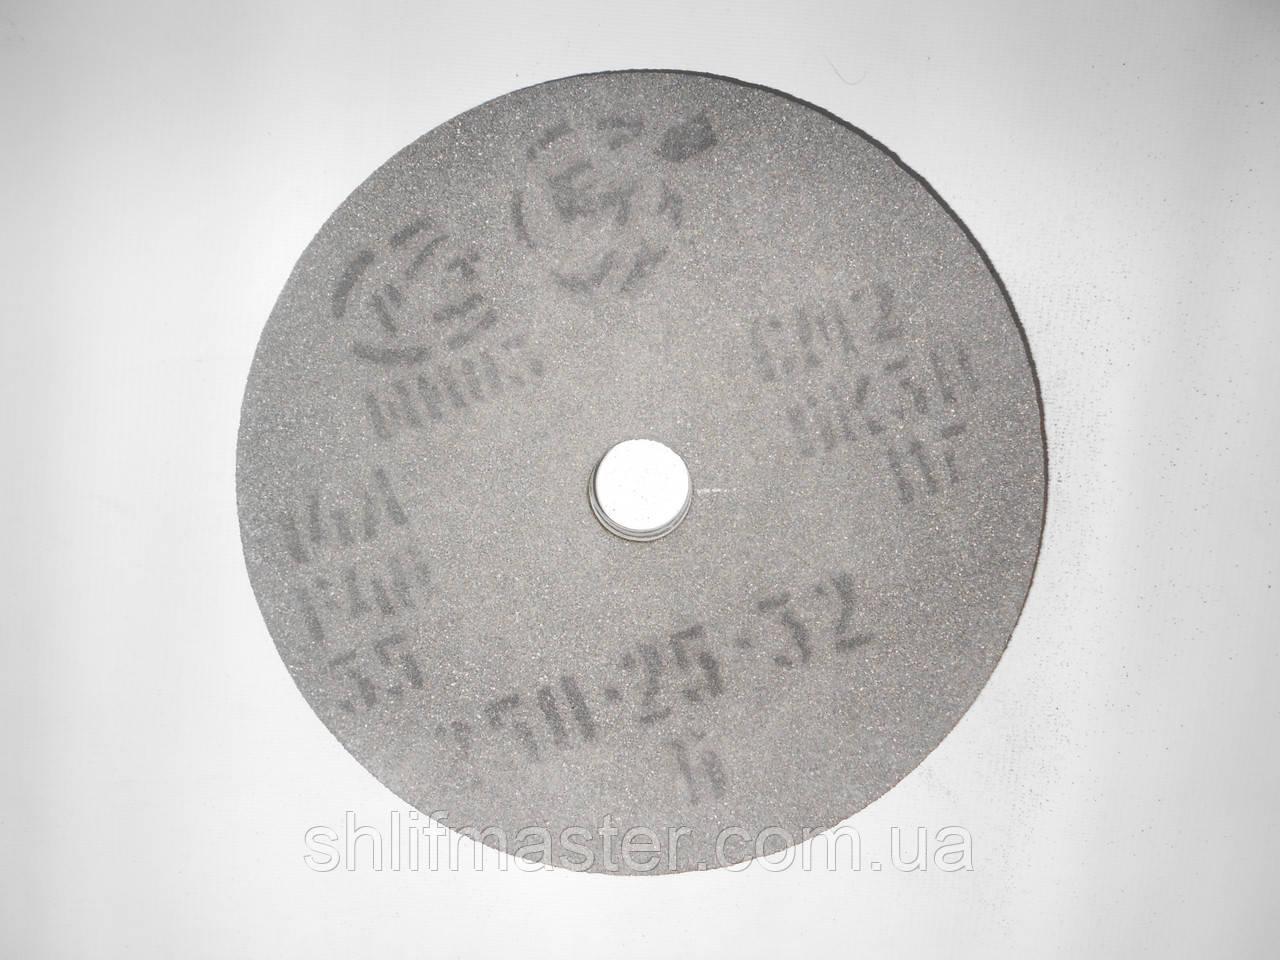 Круг шлифовальный электрокорунд серый керамика 14А ПП 250х25х32 25-40 СМ-СТ/F60-F-40 K-O